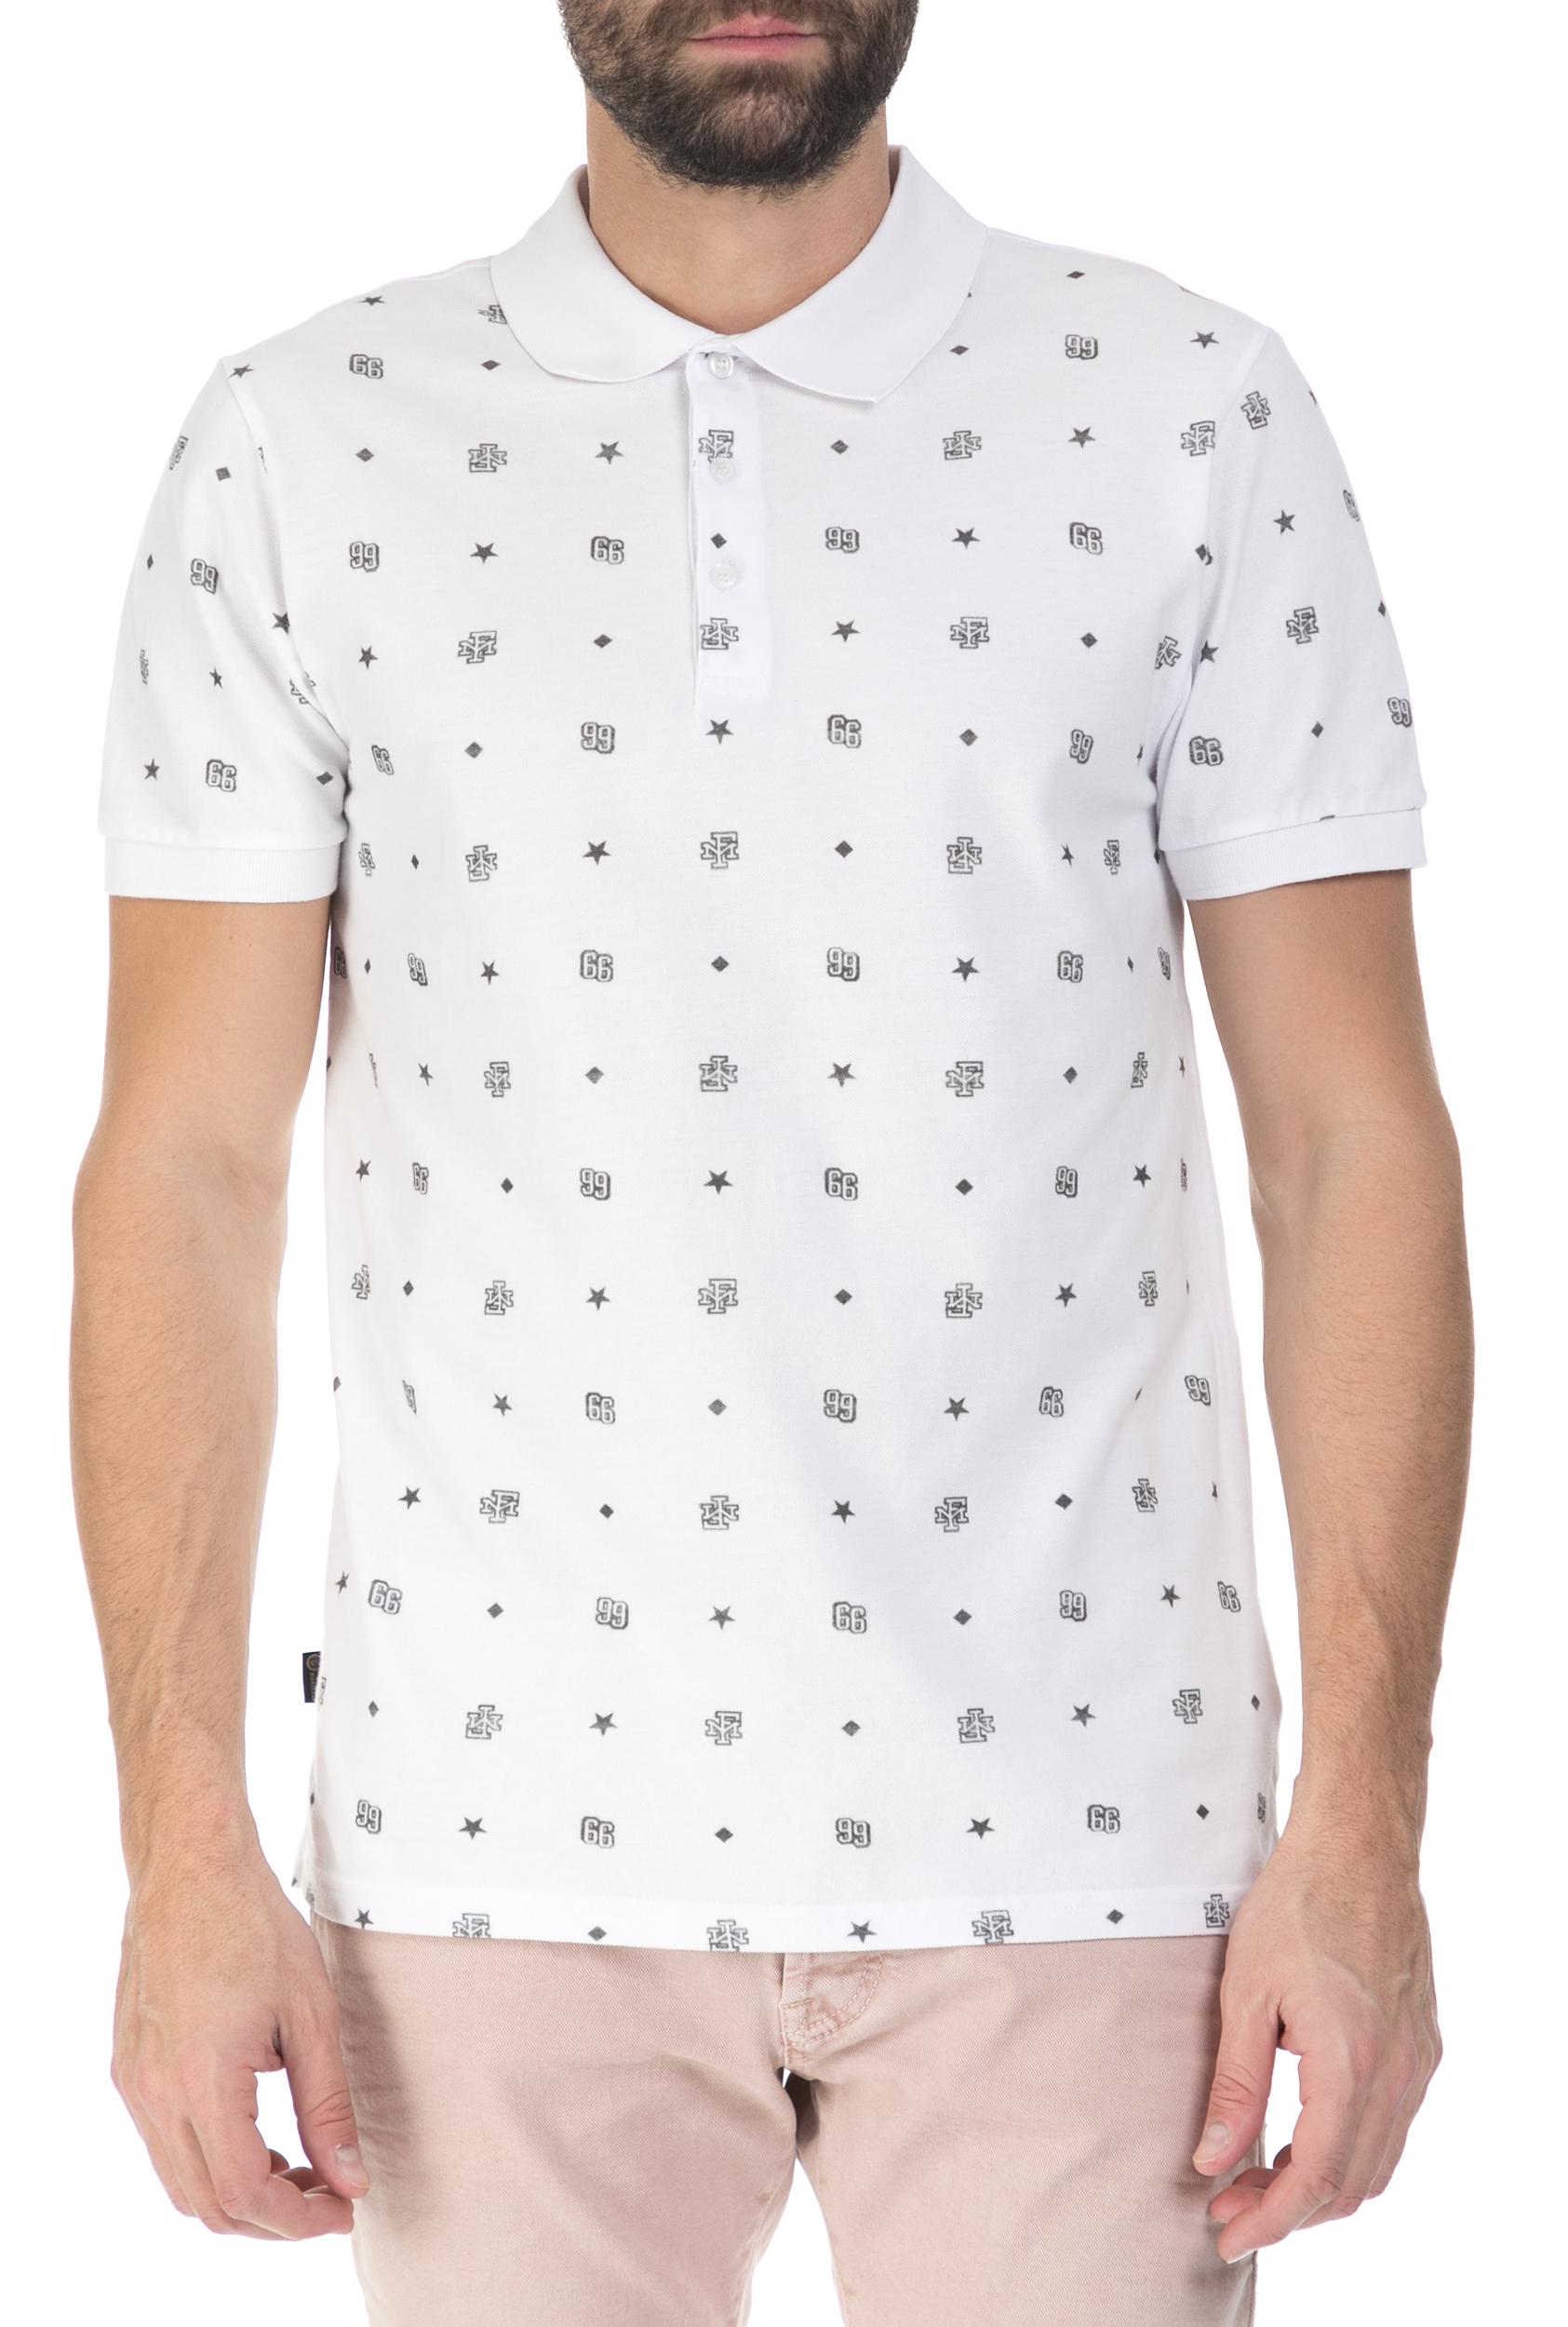 aa234750c332 FRANKLIN   MARSHALL - Ανδρική polo μπλούζα Franklin   Marshall λευκή - μαύρη